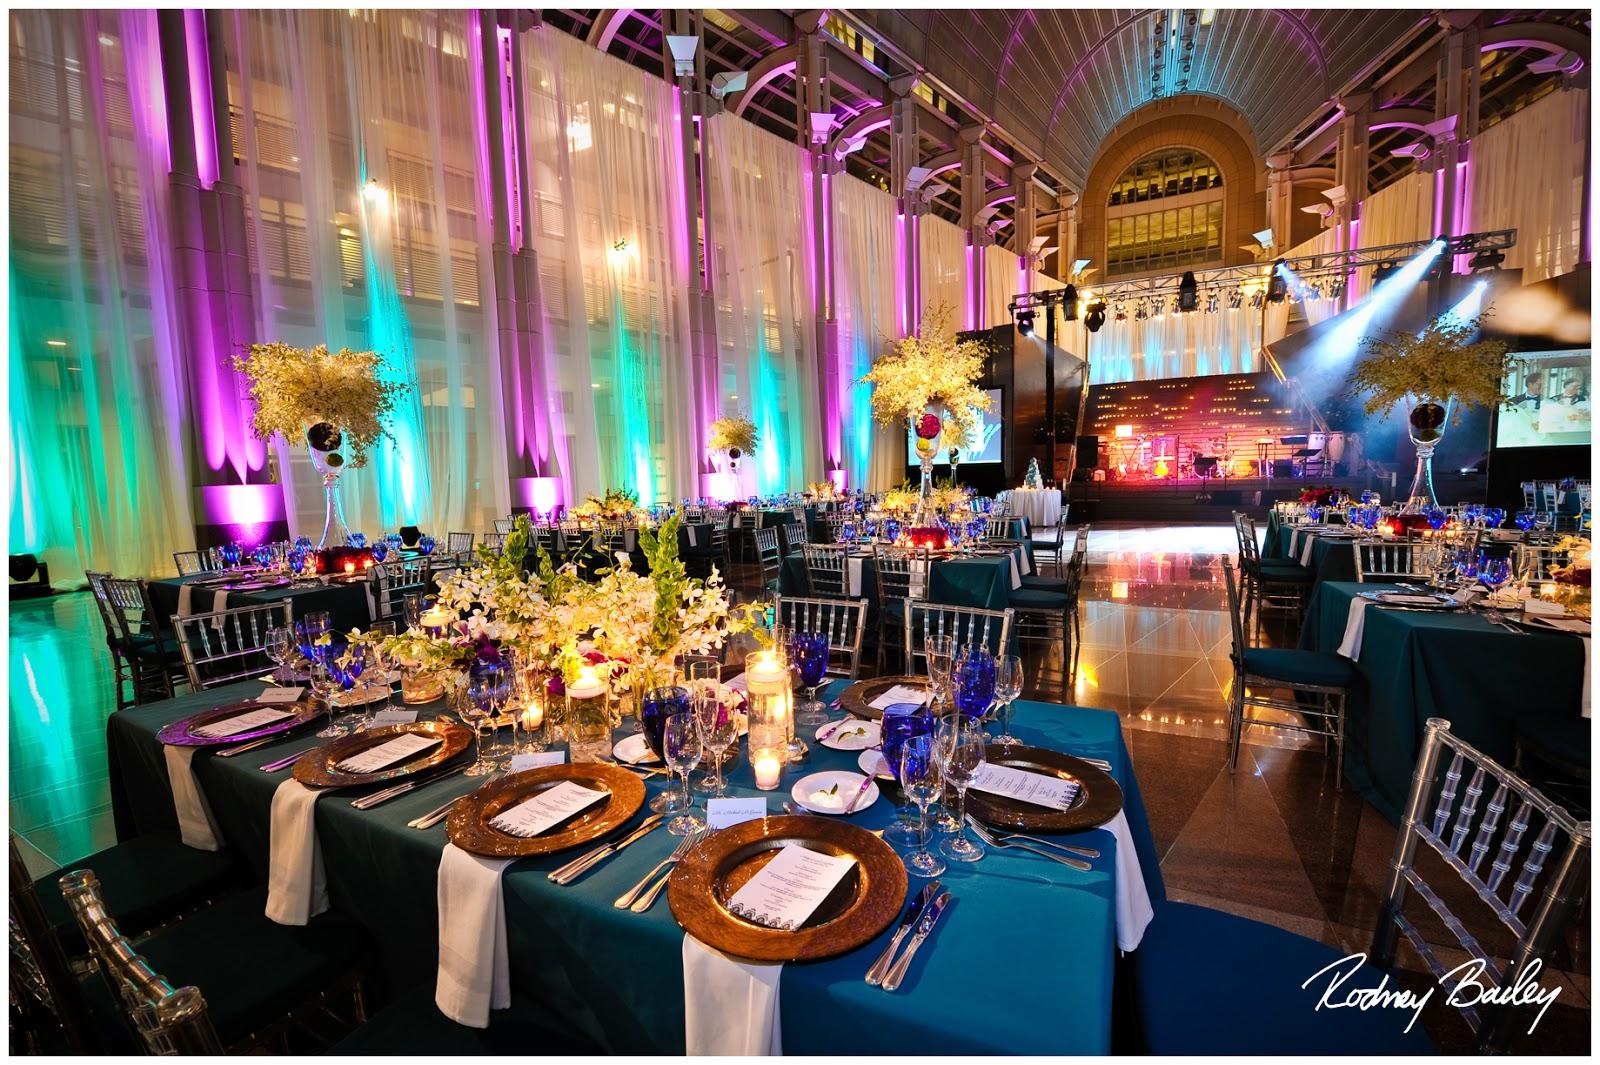 Bridal Bubbly: DC Wedding Venues {Sleek & Modern}